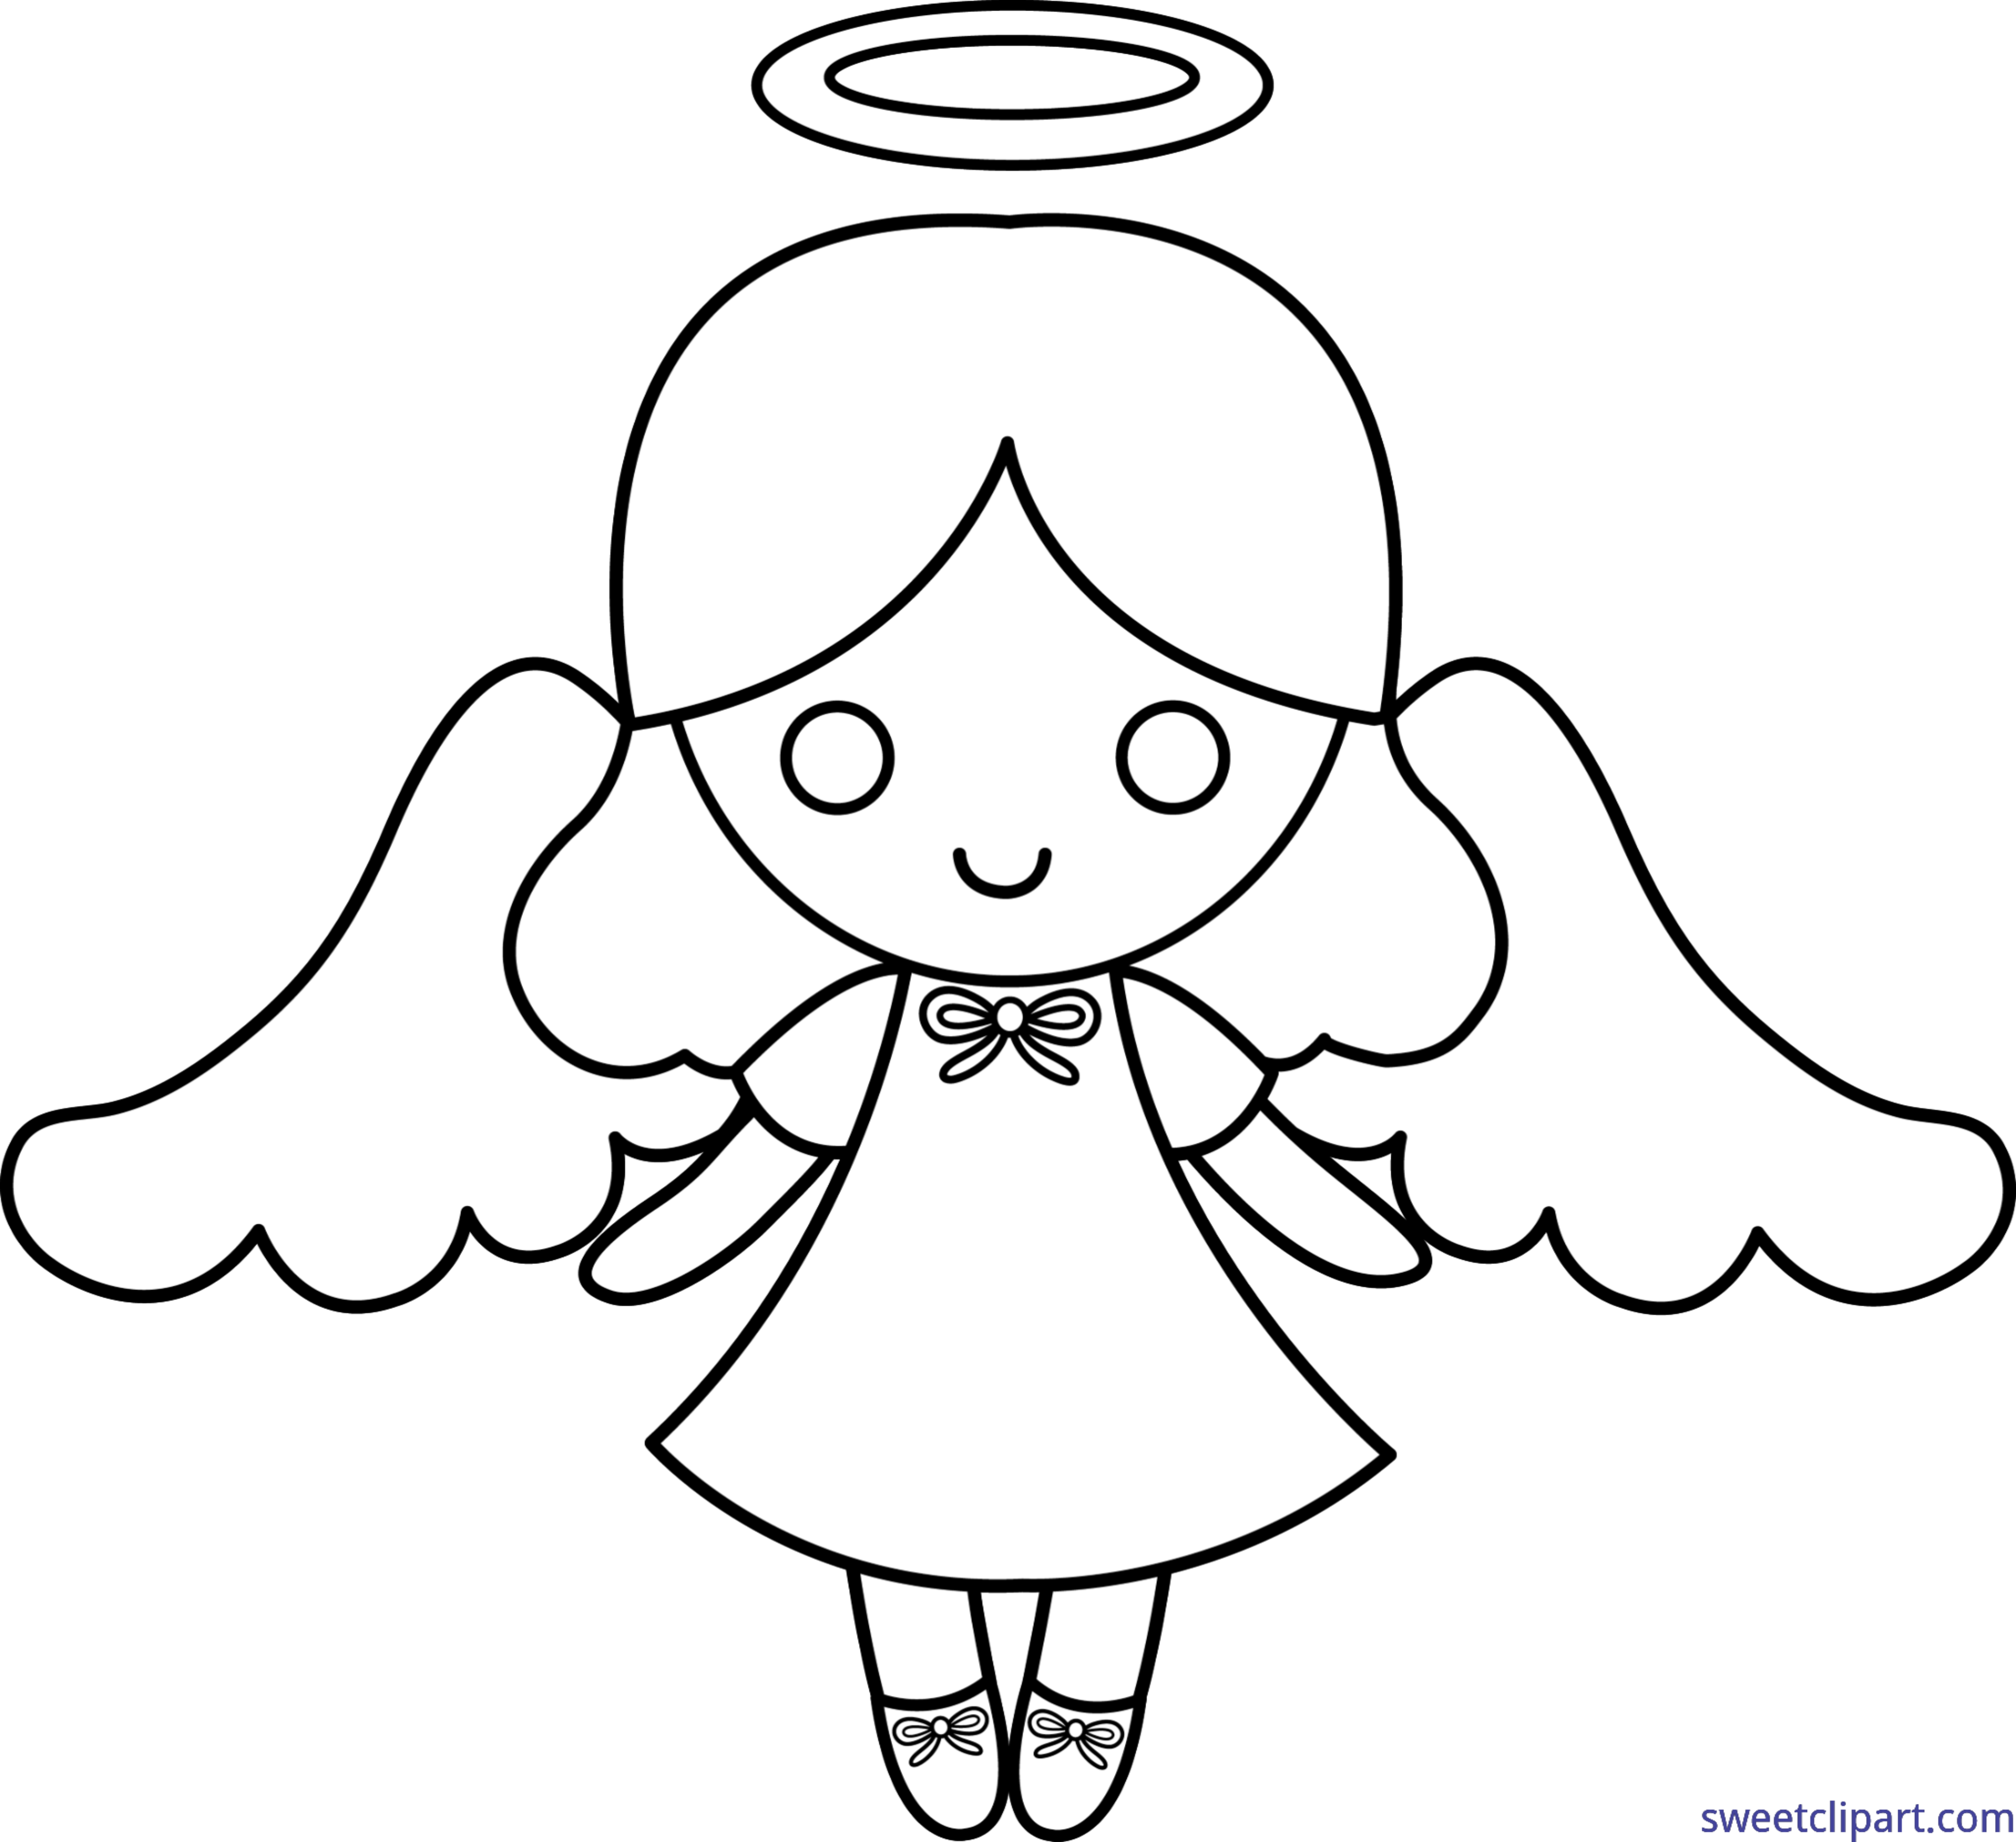 Clipart angel line art. Little lineart clip sweet